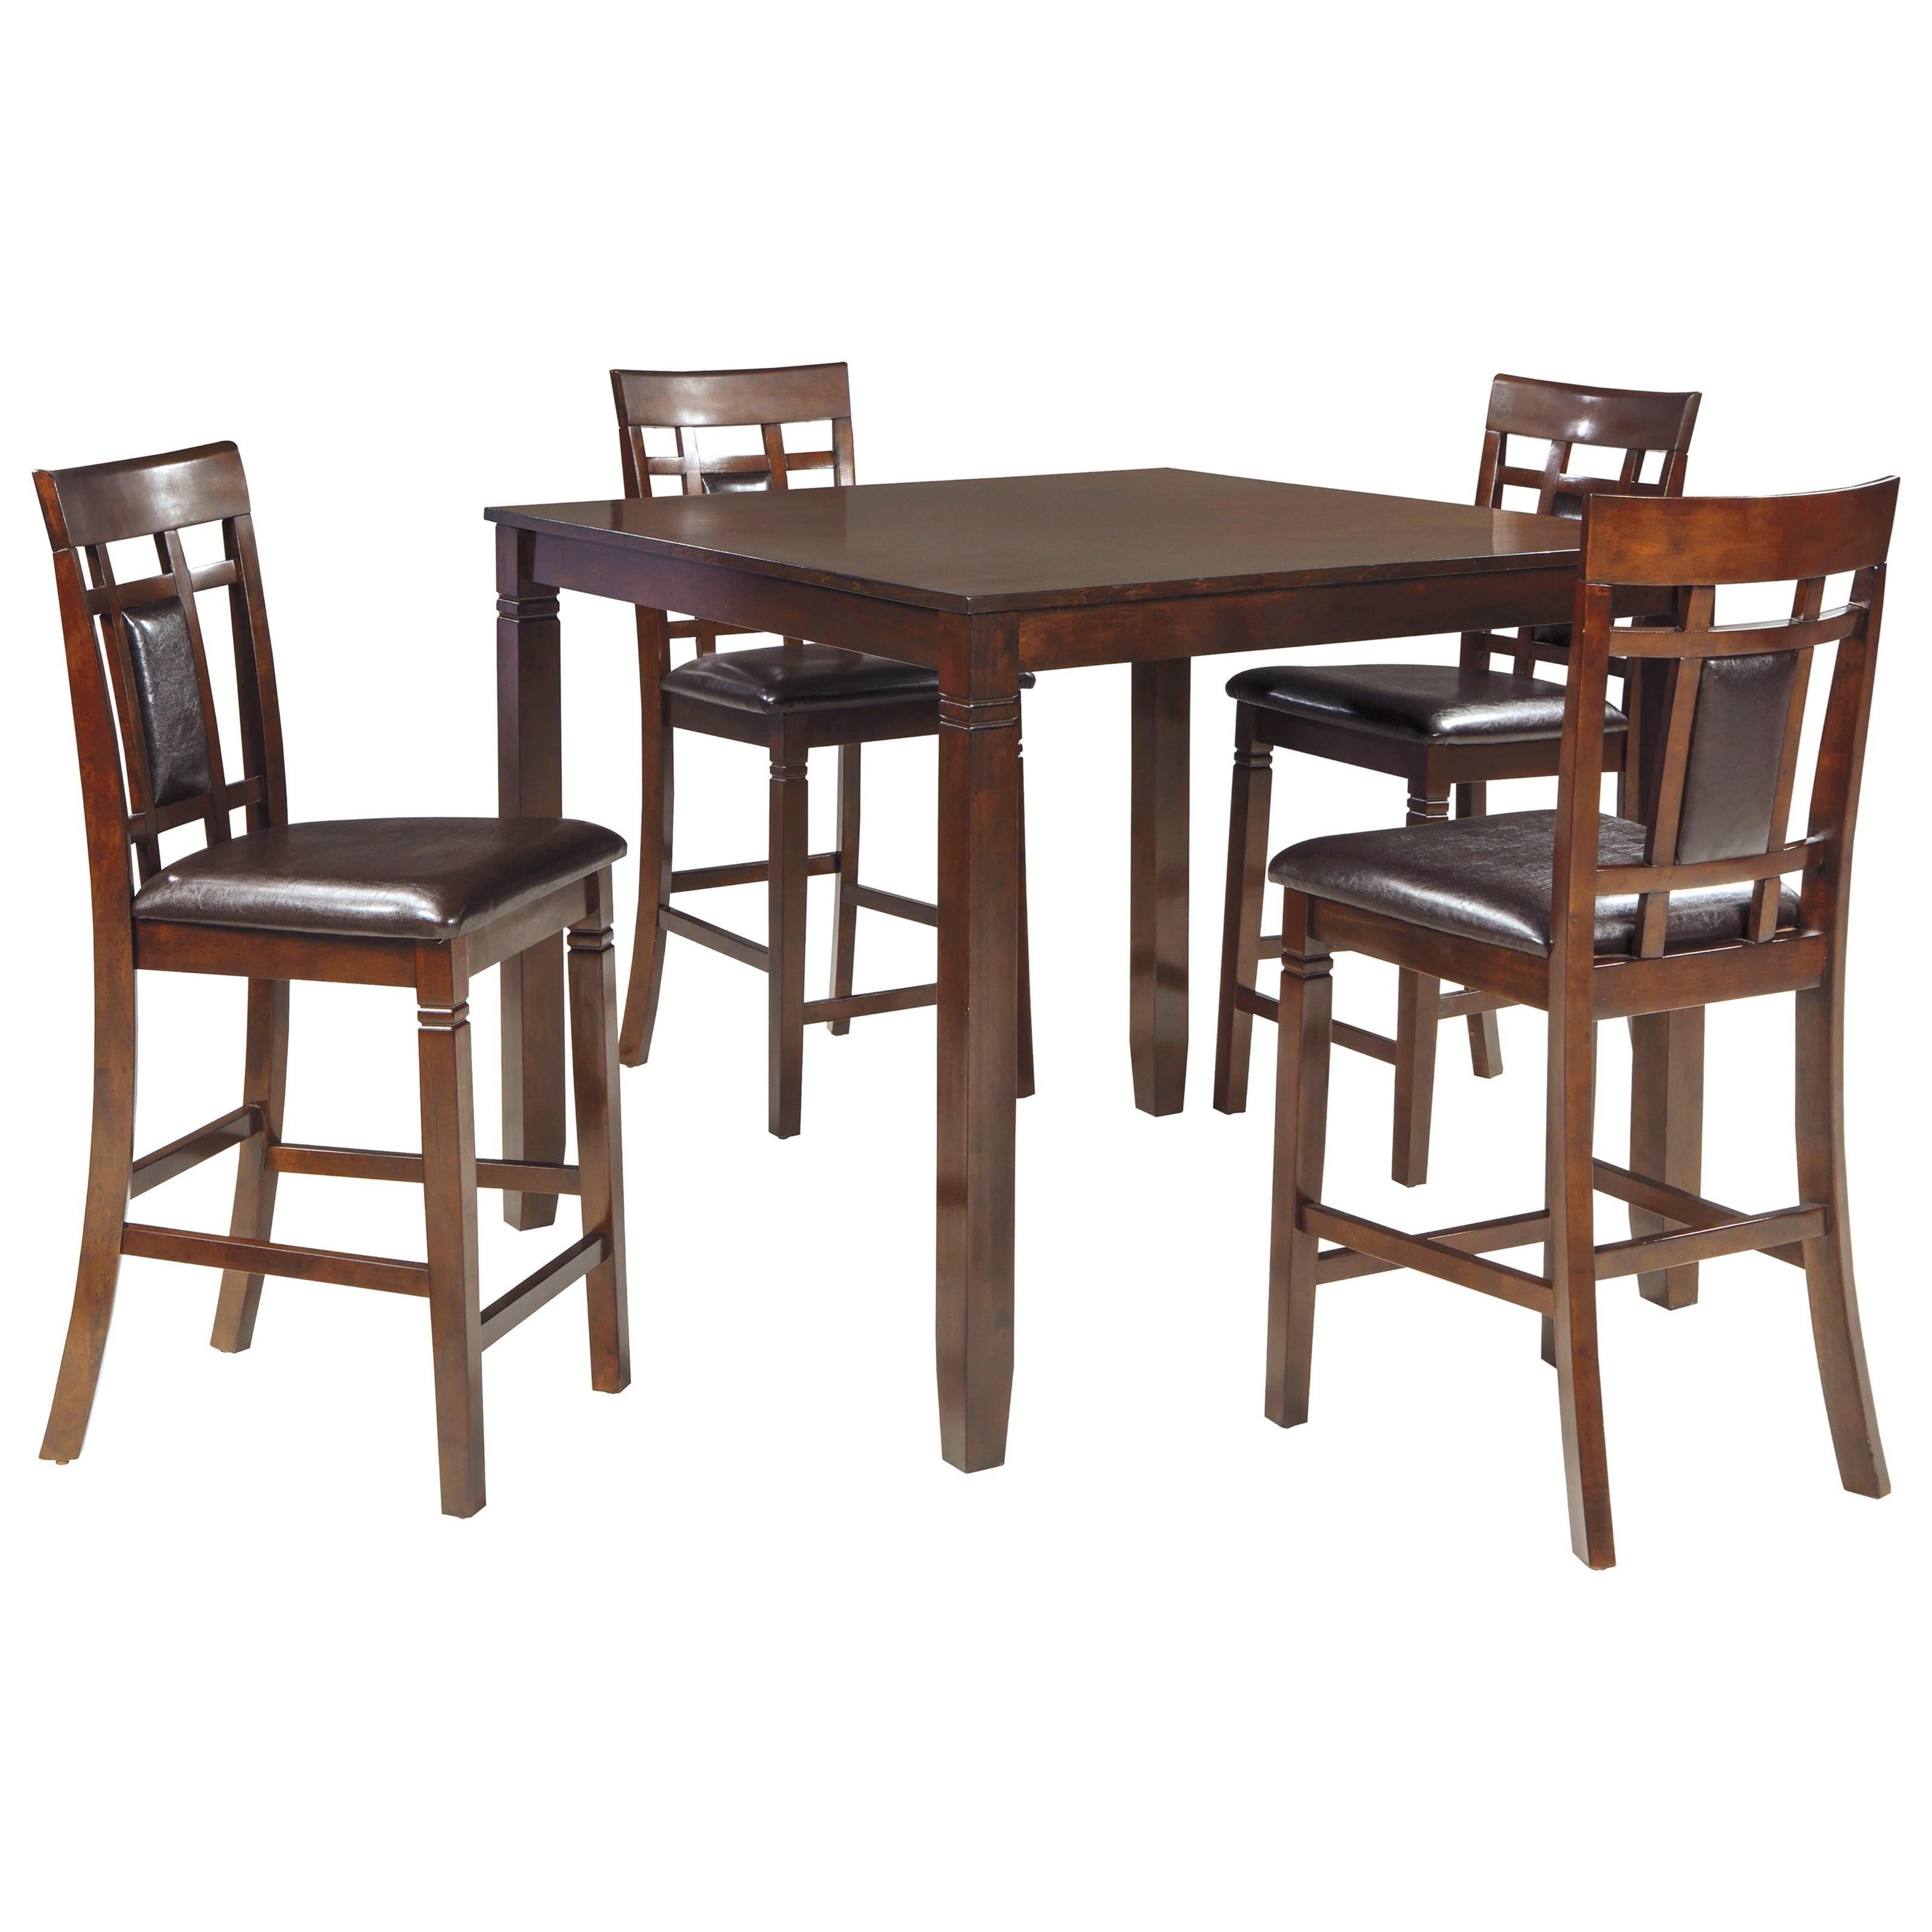 Signature Design By Ashley Bennox Contemporary Signature Design By Ashley Dining Room Counter Table Set